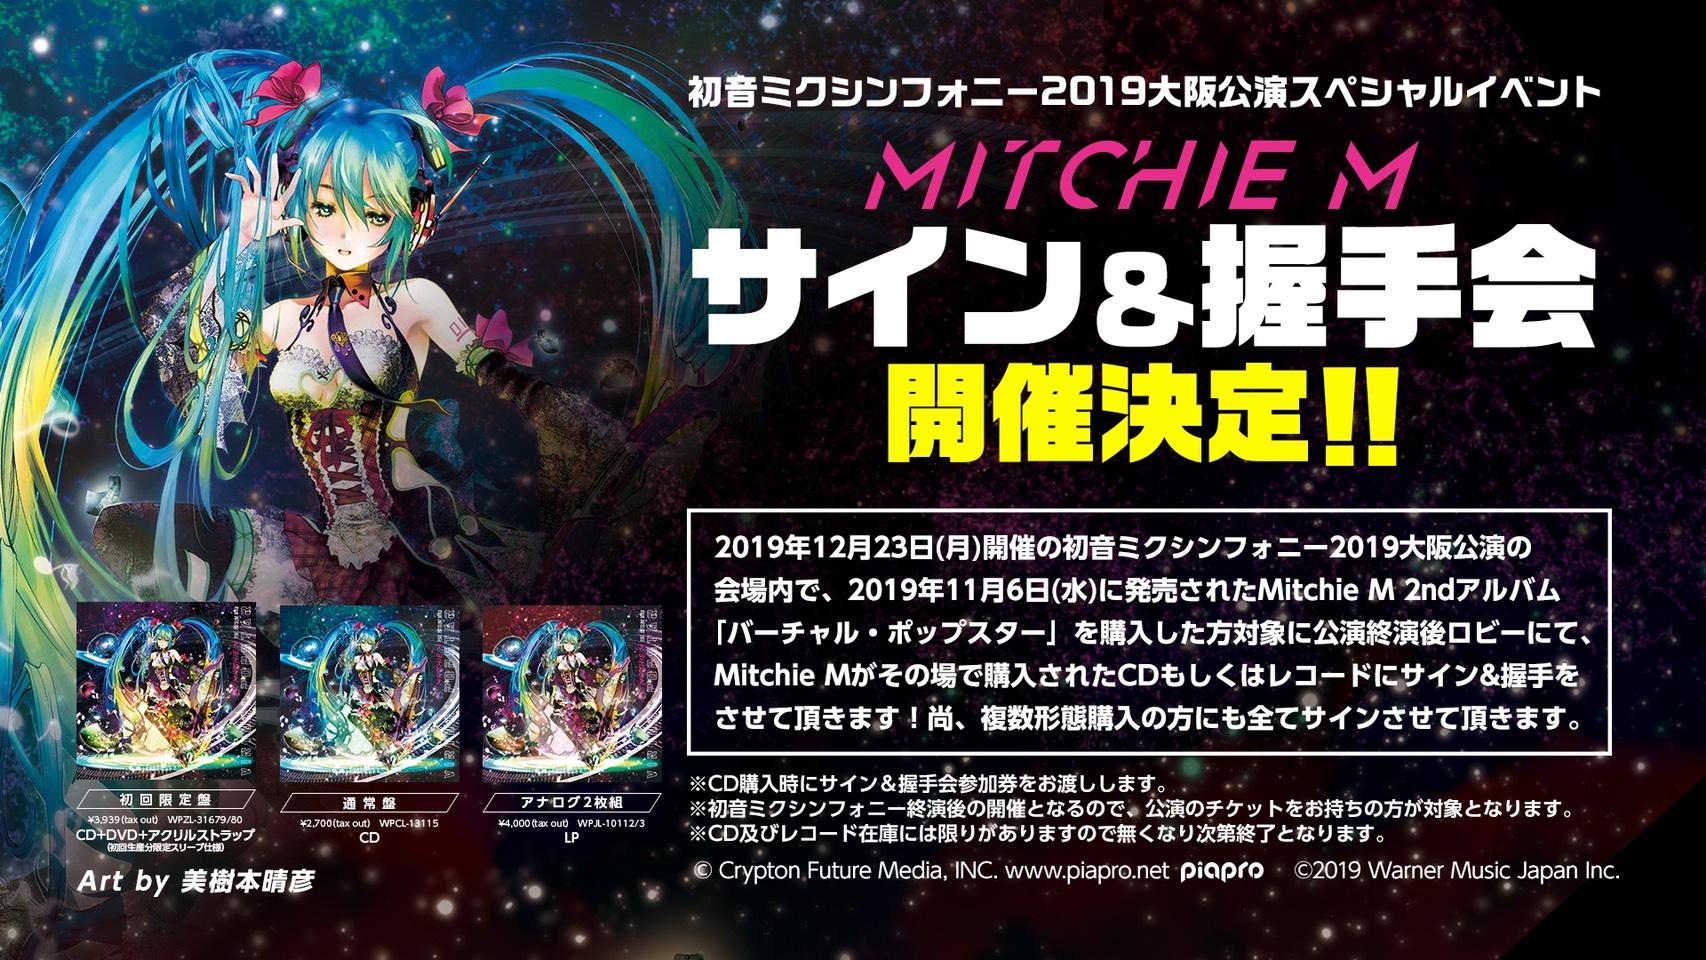 Mitchie M サイン&握手会